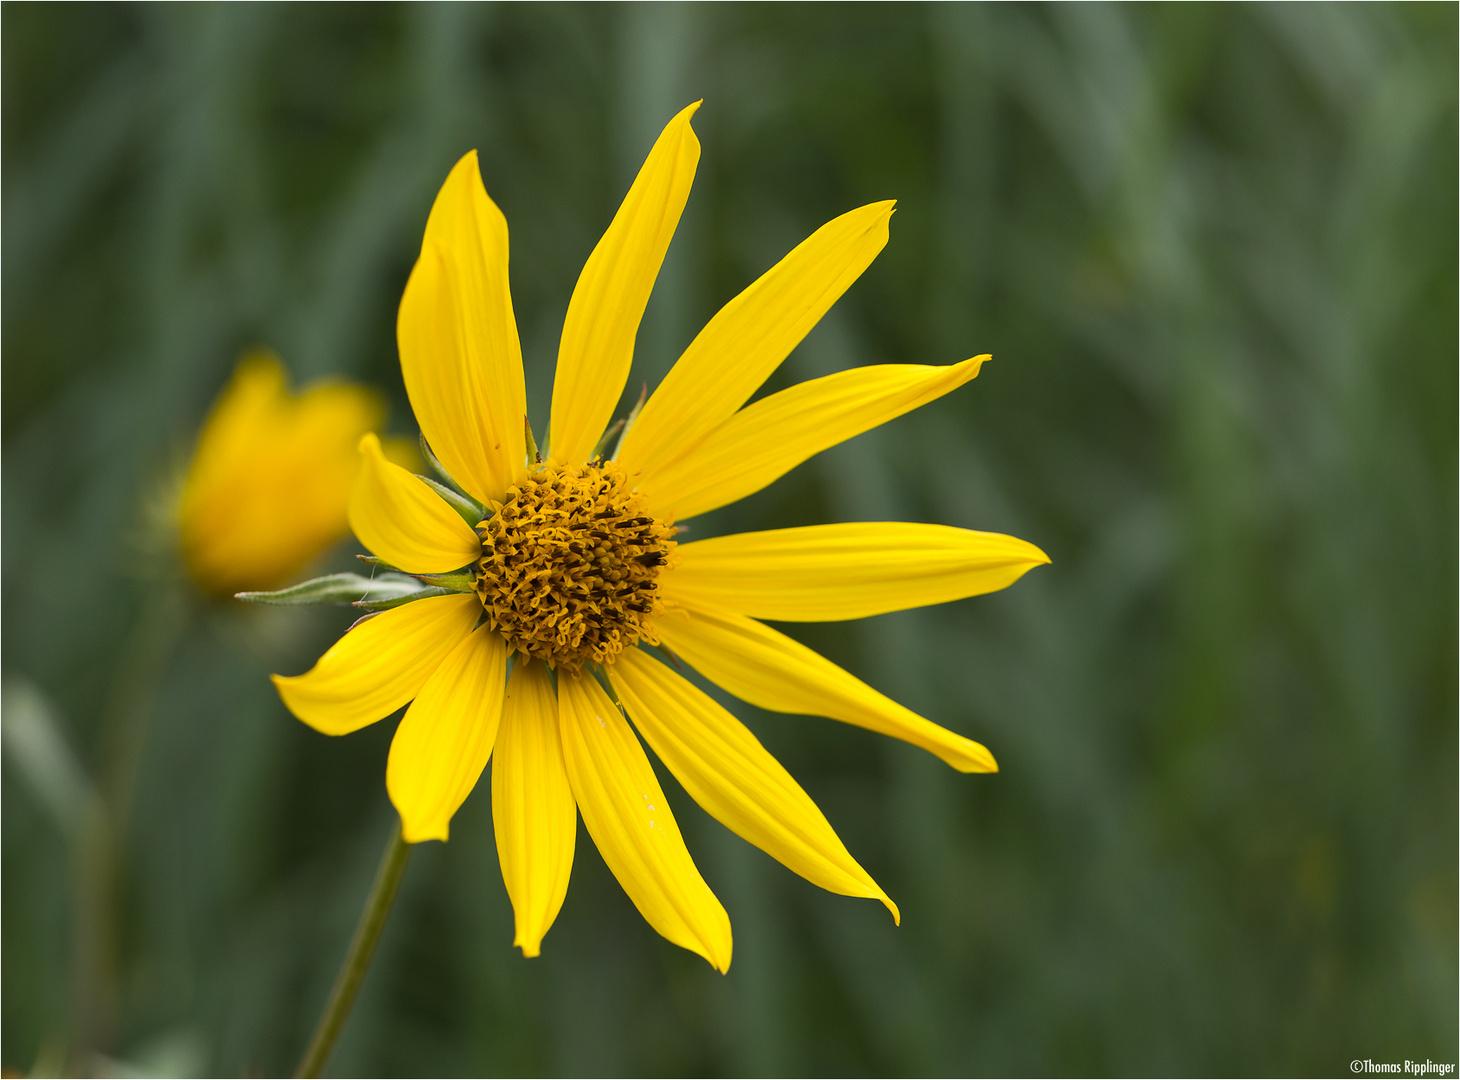 Riesen - Sonnenblume (Helianthus giganteus).